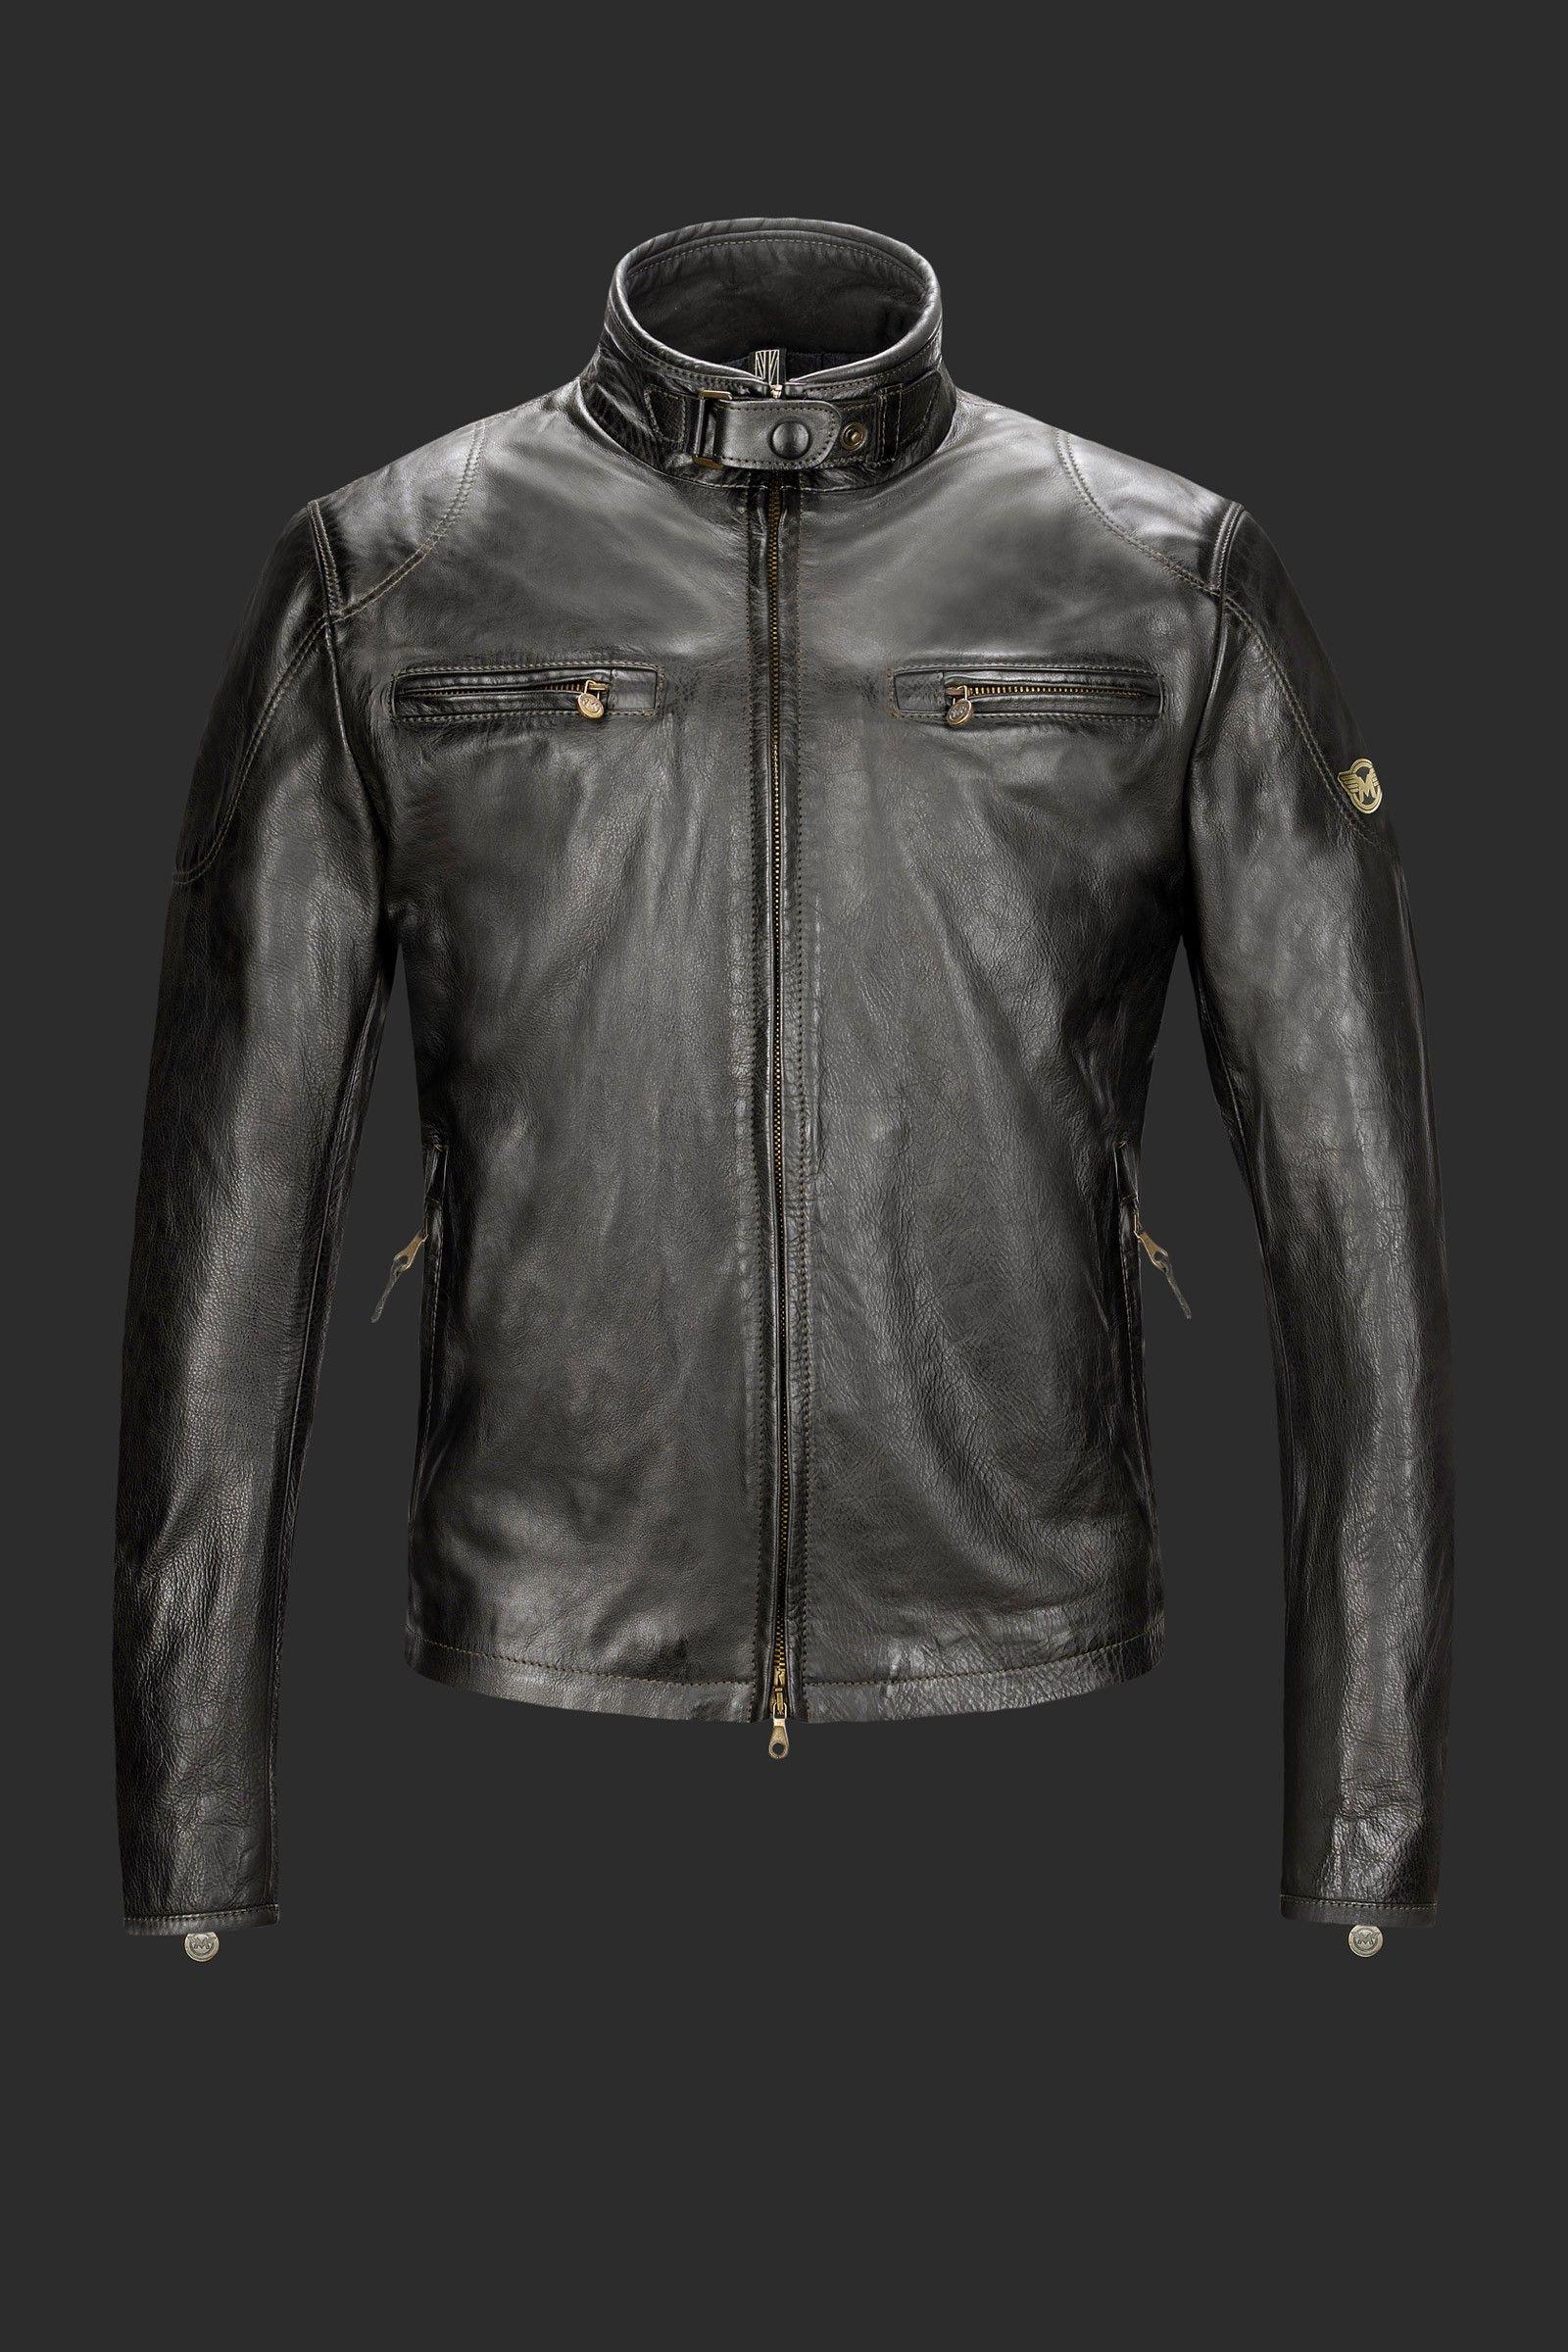 OSBORNE BLOUSON - jackets - man - Matchless London